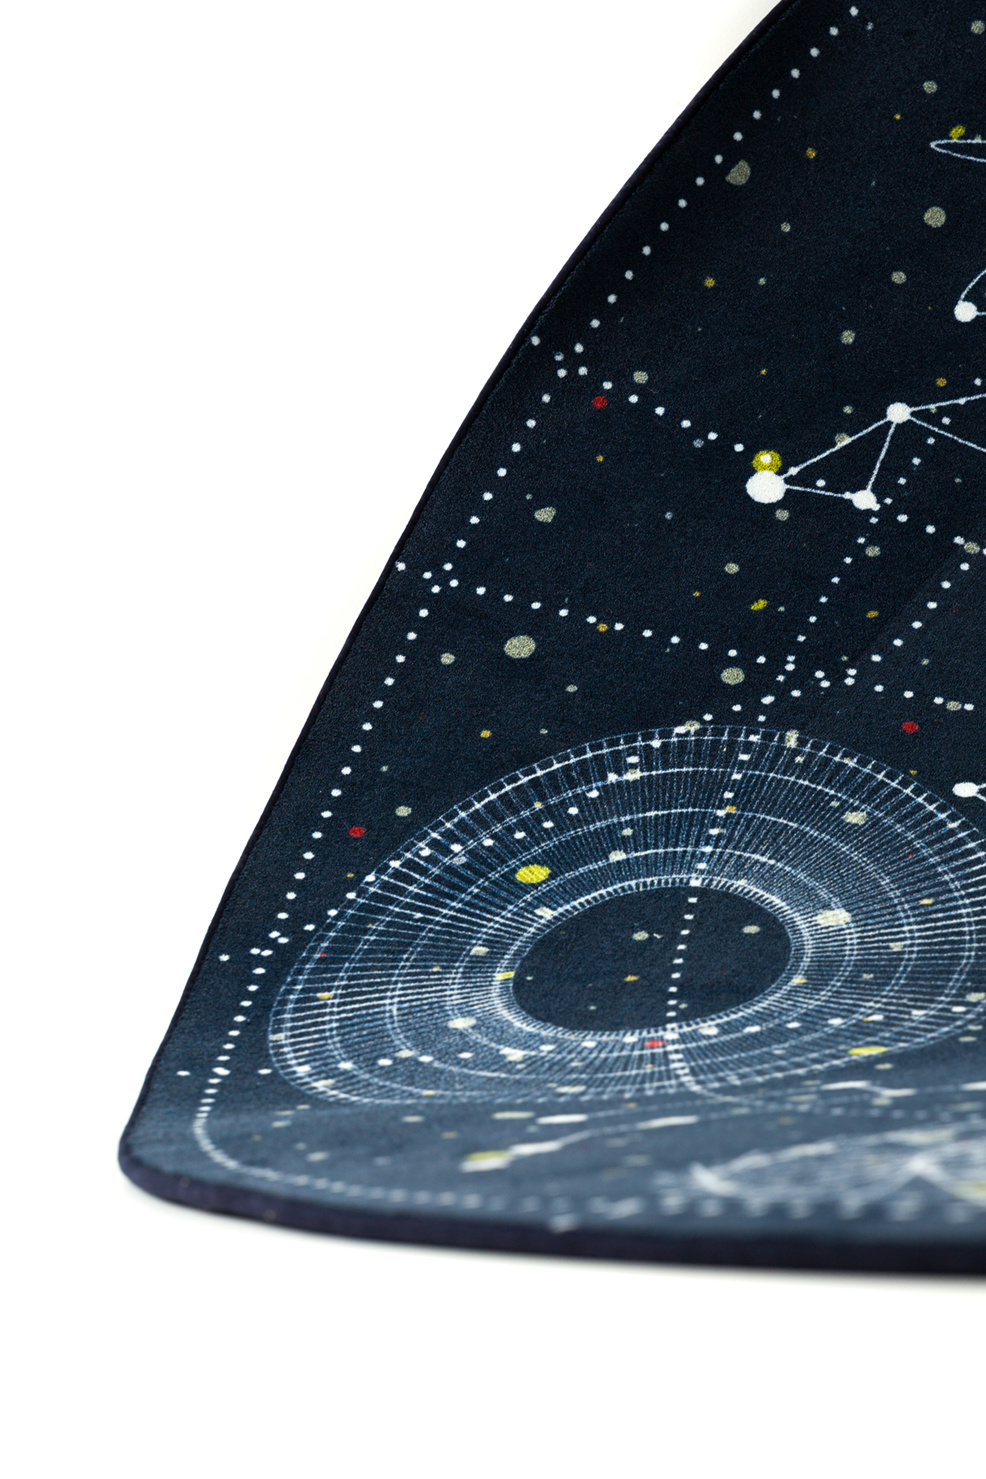 Celestial by Edward van Vliet rond-2